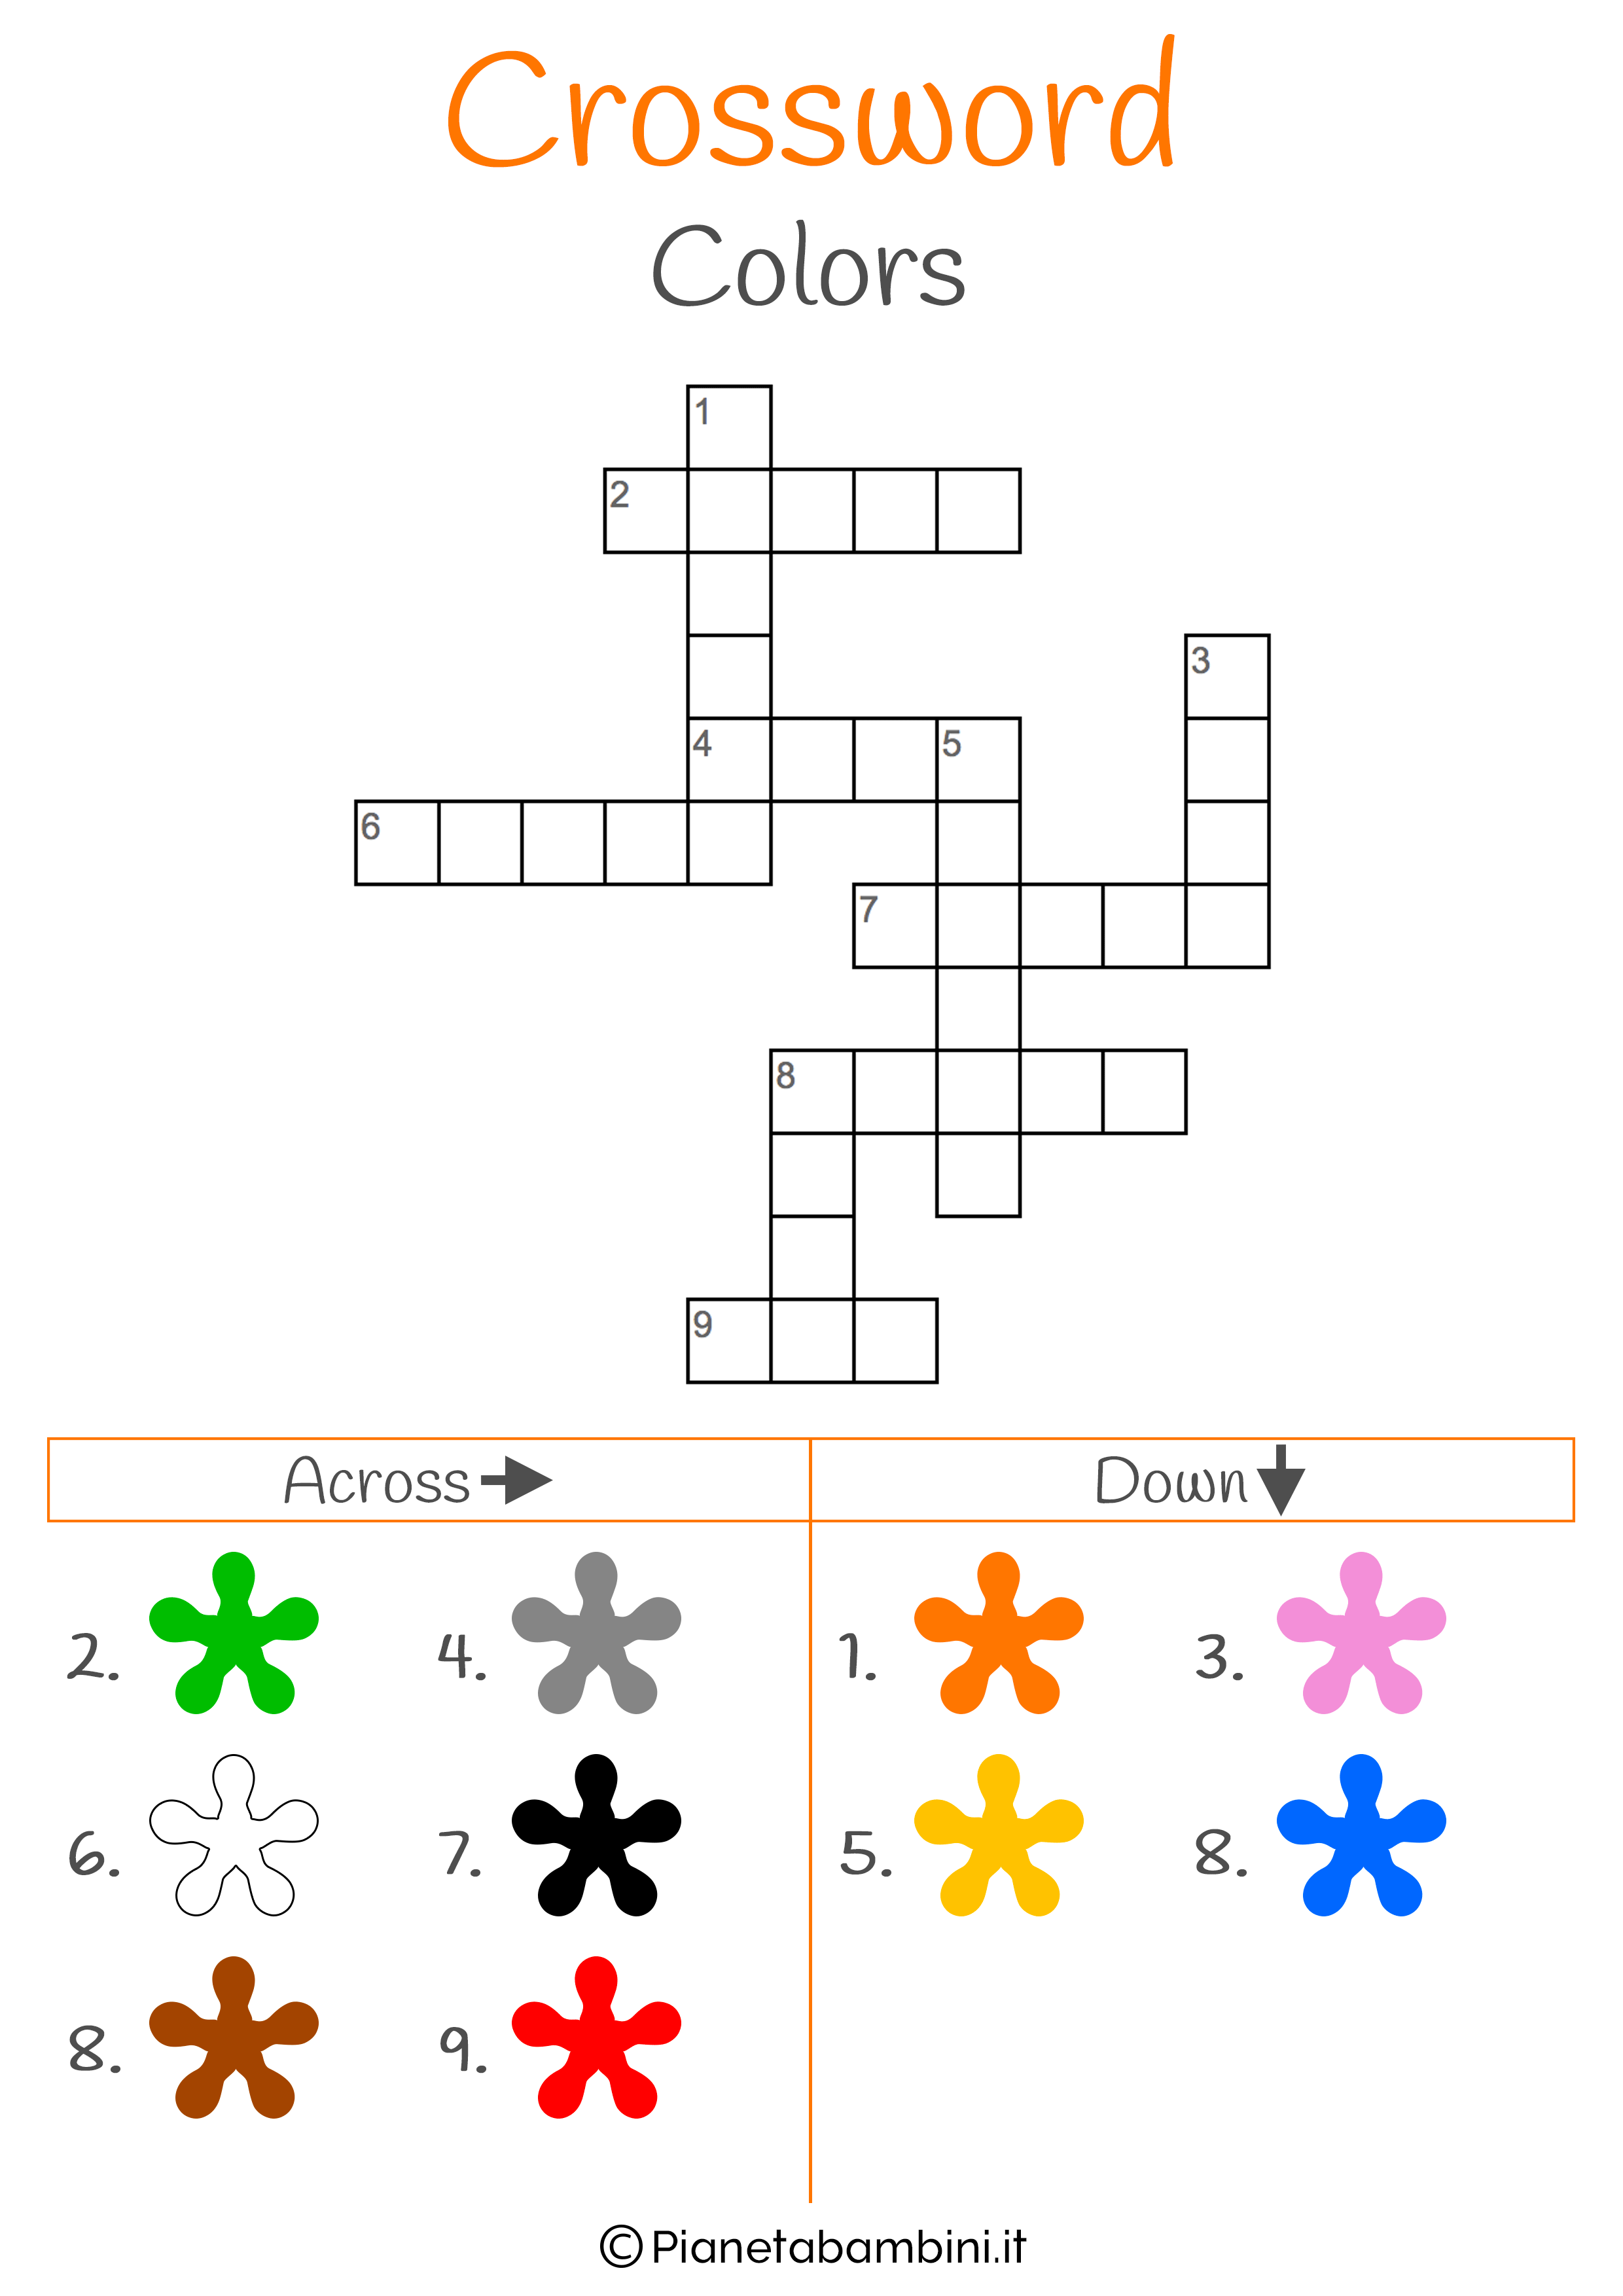 Cruciverba in inglese sui colori